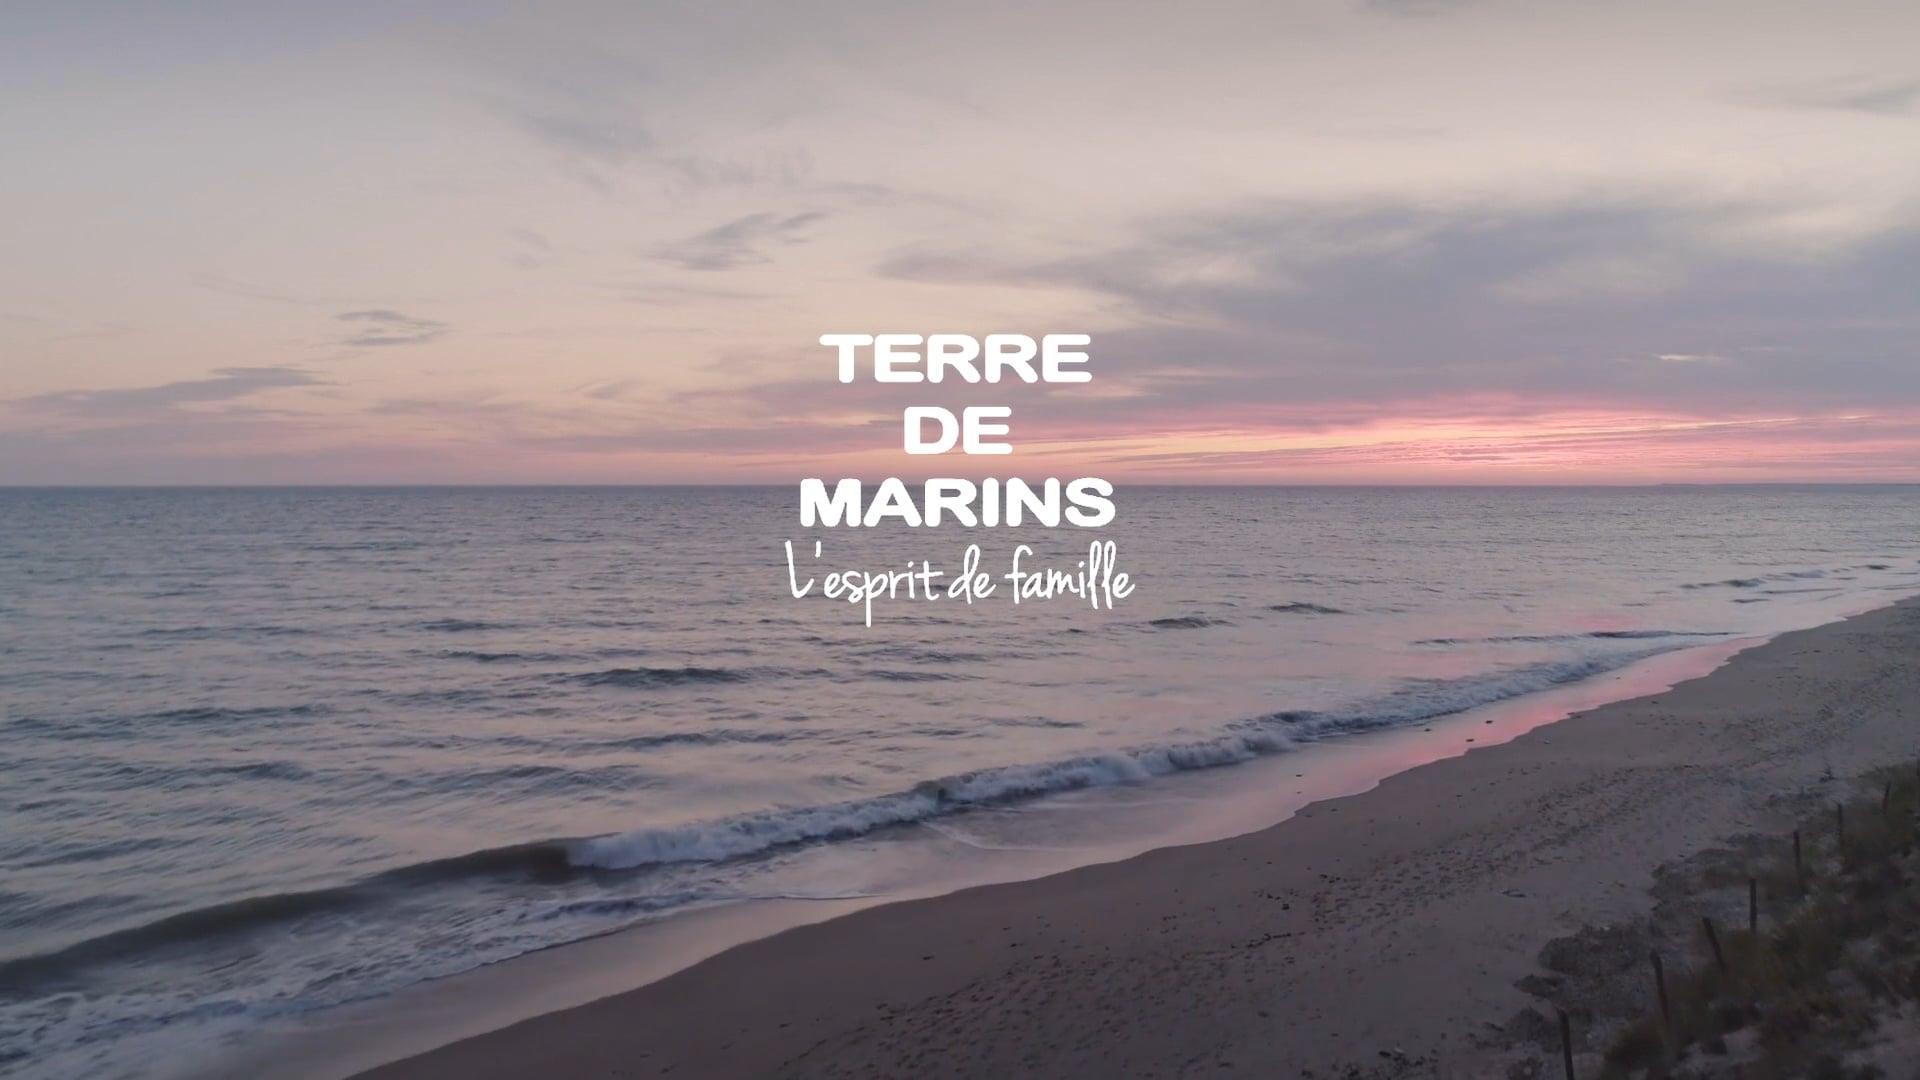 TERRE DE MARINS soutient Robin Marais - skipper lyonnais